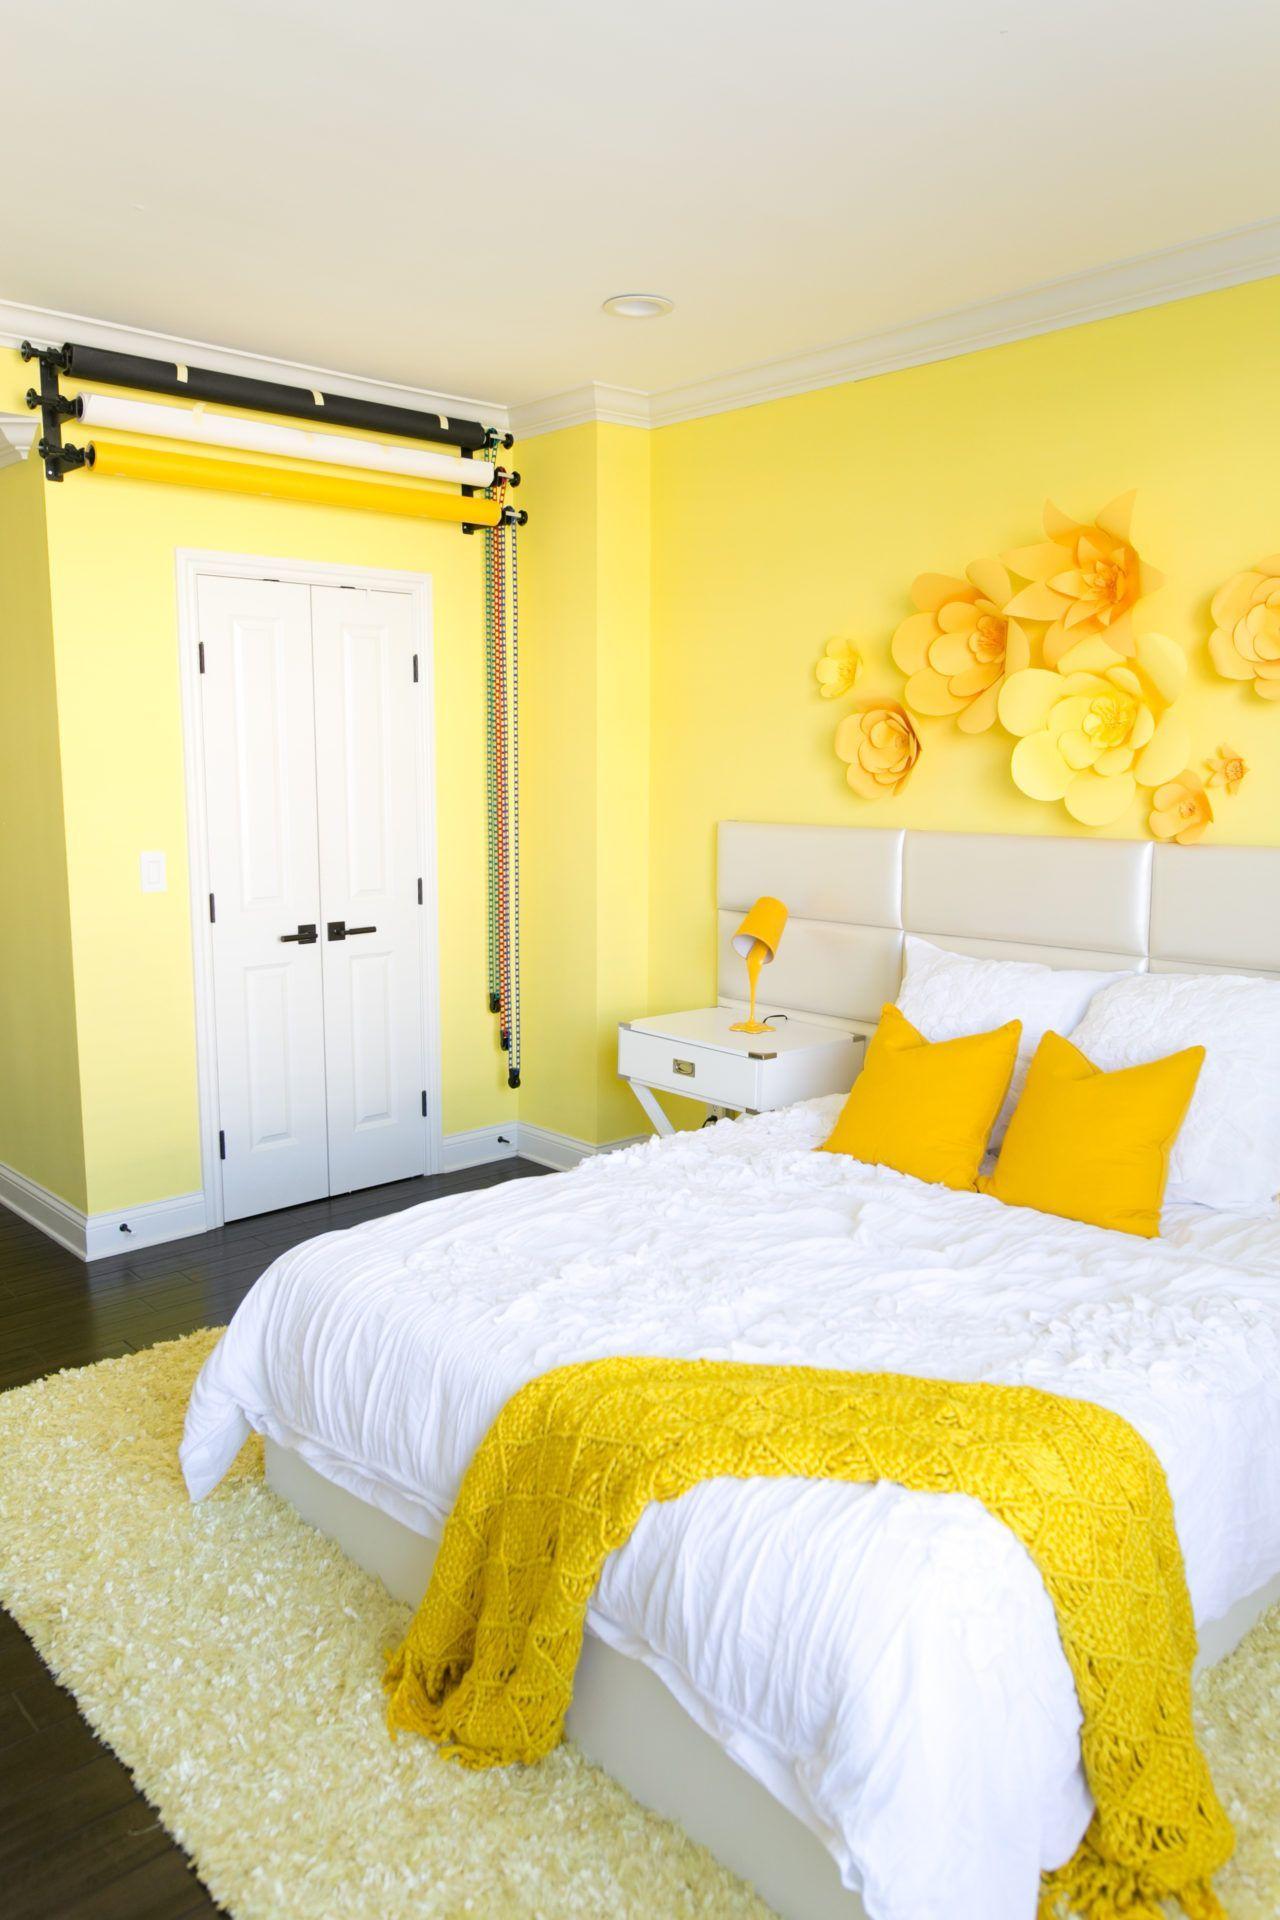 6 Color Trends for Interior Design - TrendBook Trend